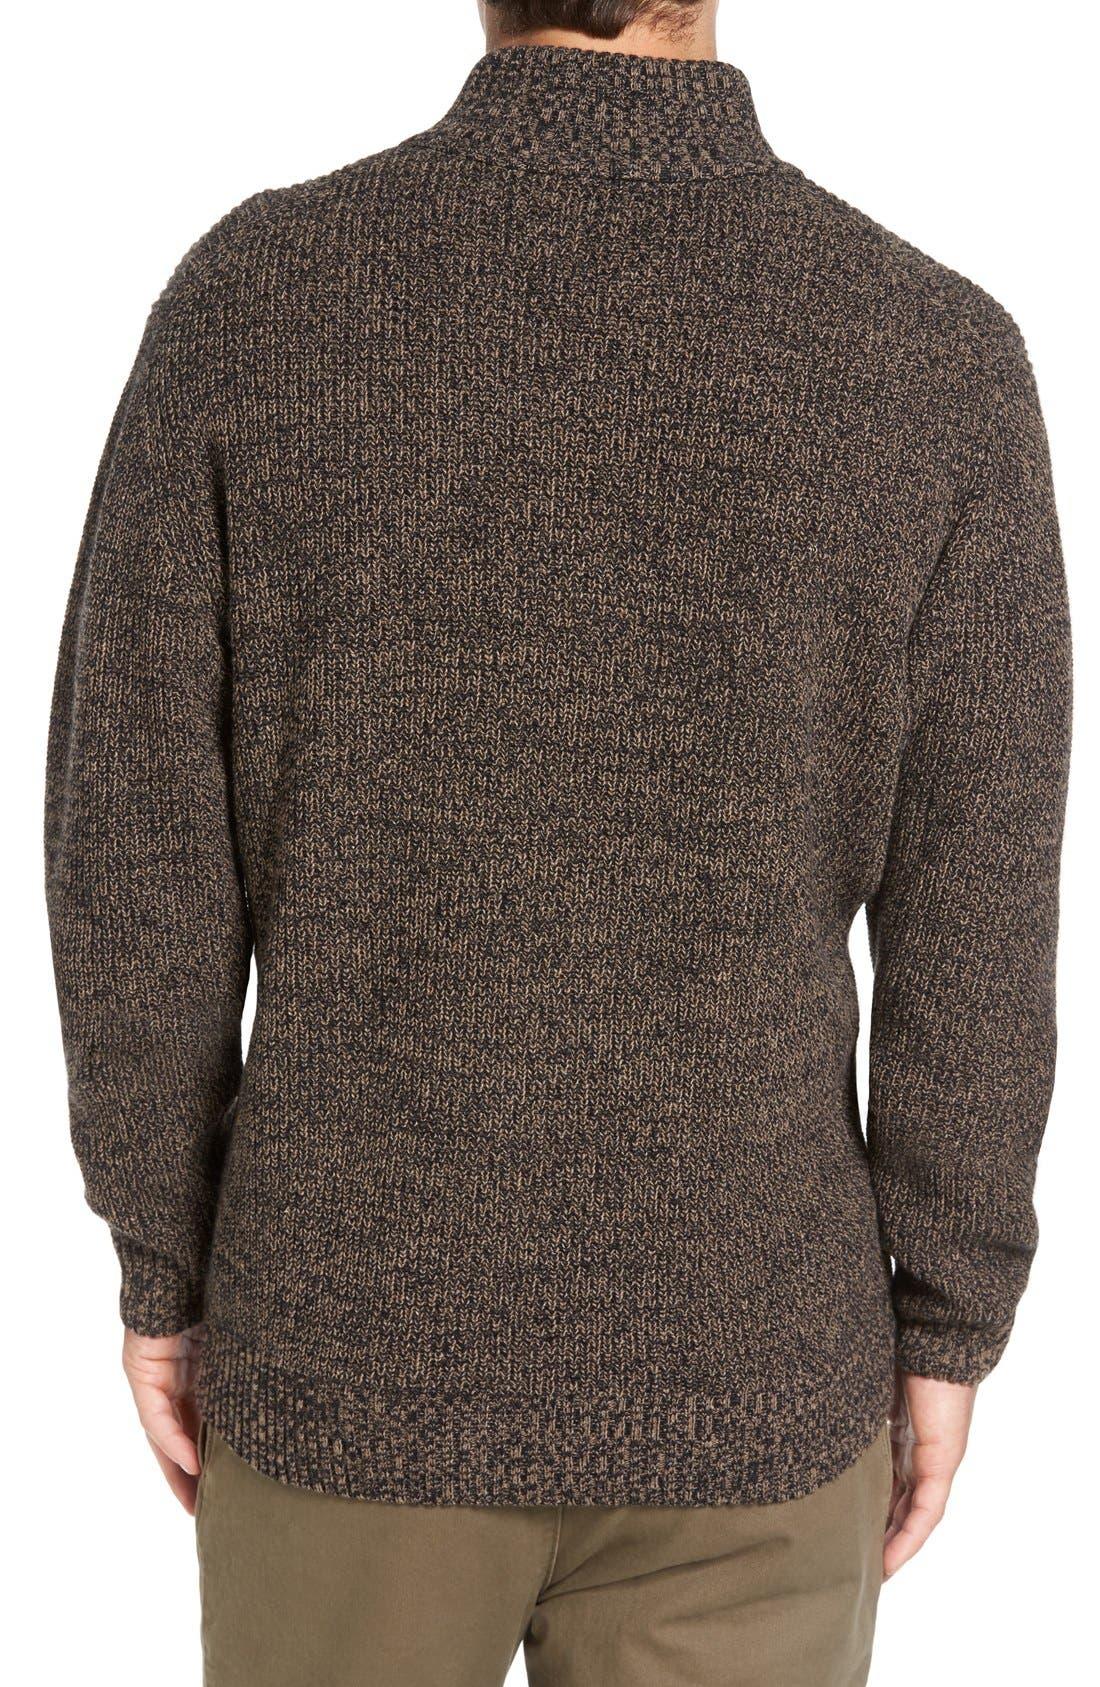 'Woodglen' Herringbone Knit Lambswool Quarter Zip Sweater,                             Alternate thumbnail 2, color,                             Walnut